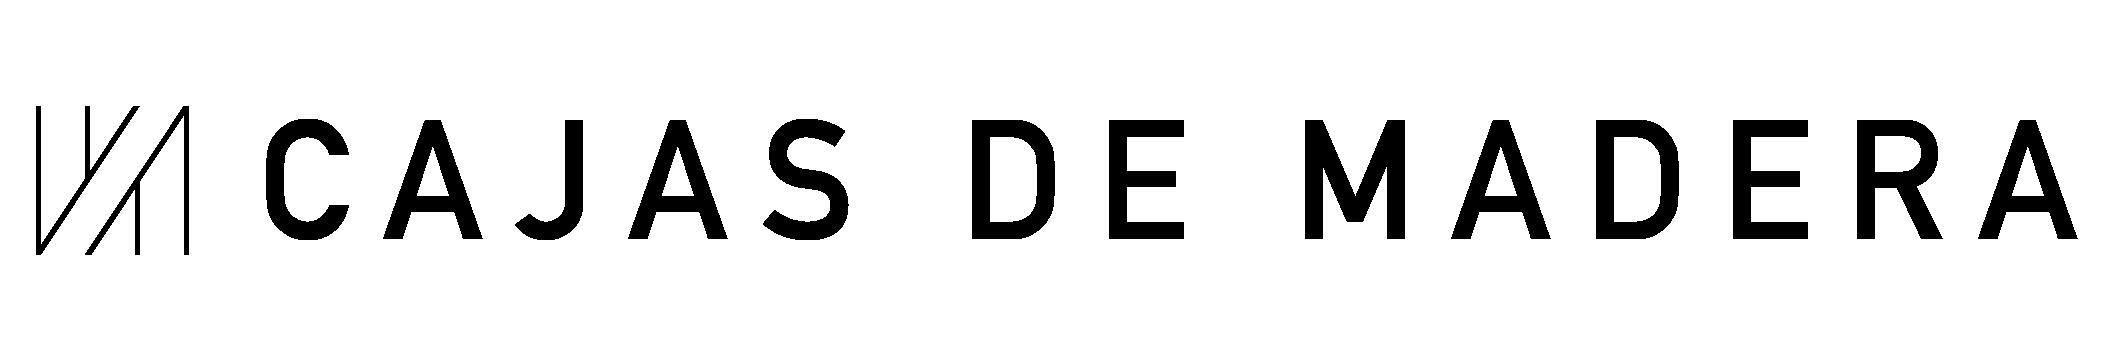 Cajasdemadera